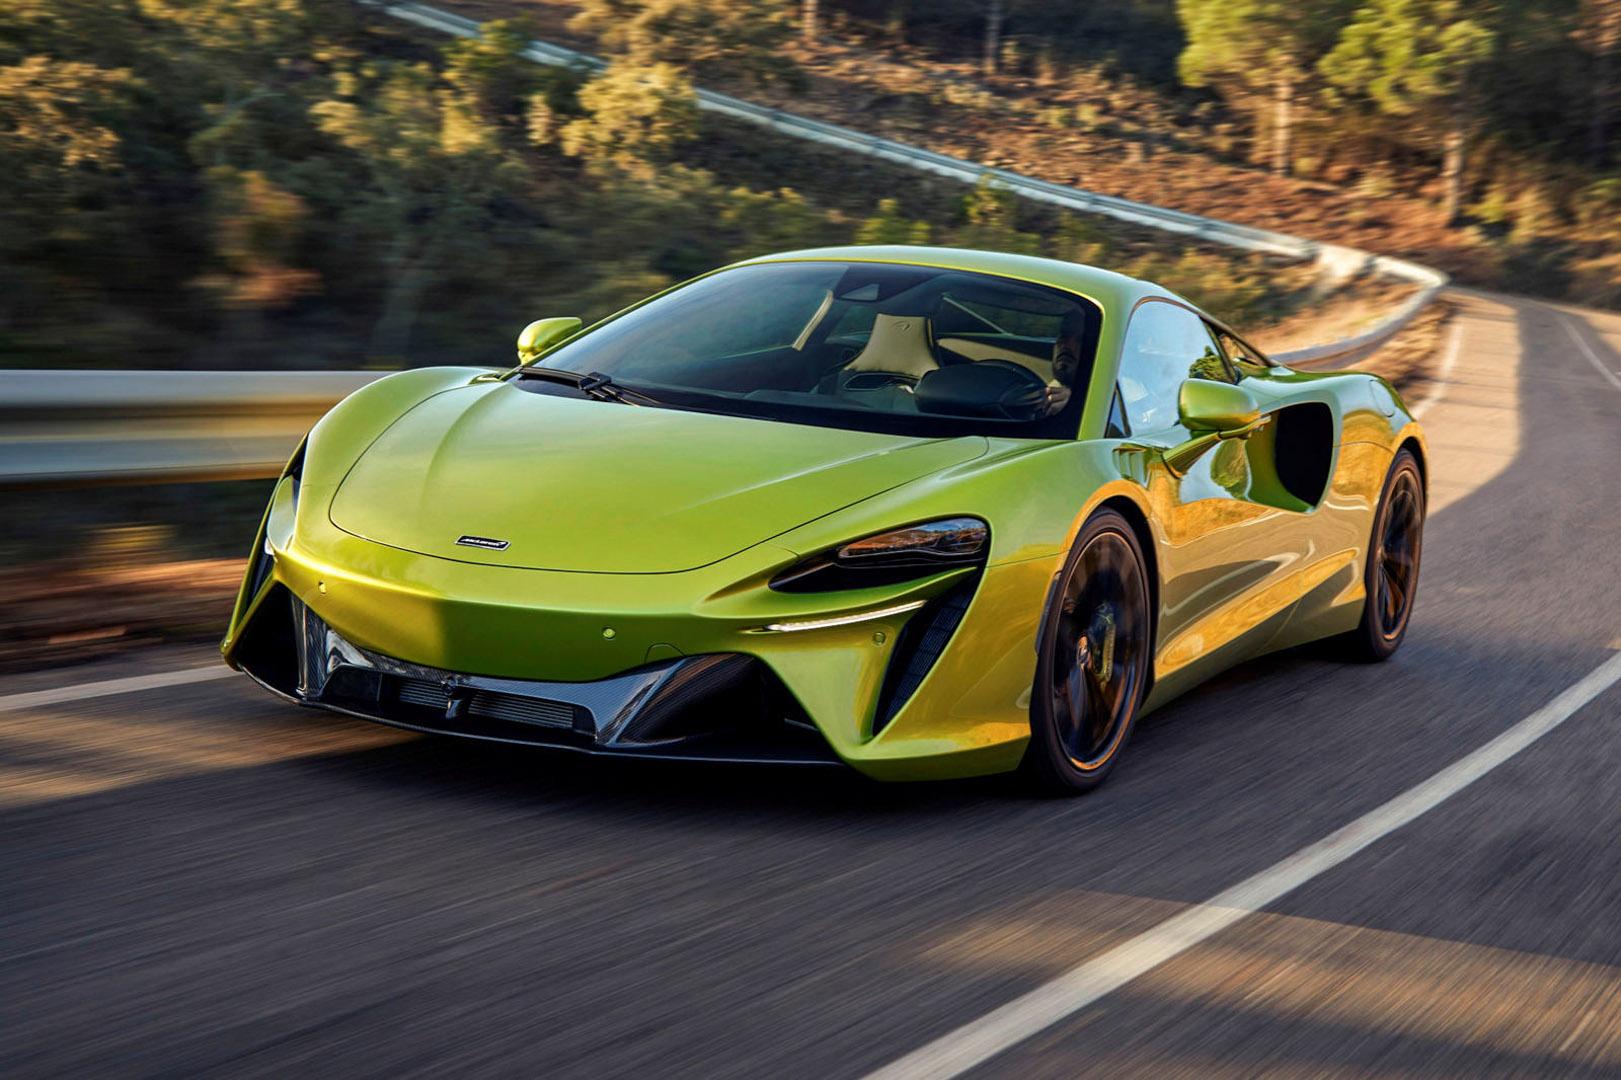 CP-McLaren tiết lộ tên của các mẫu xe mới5.jpg